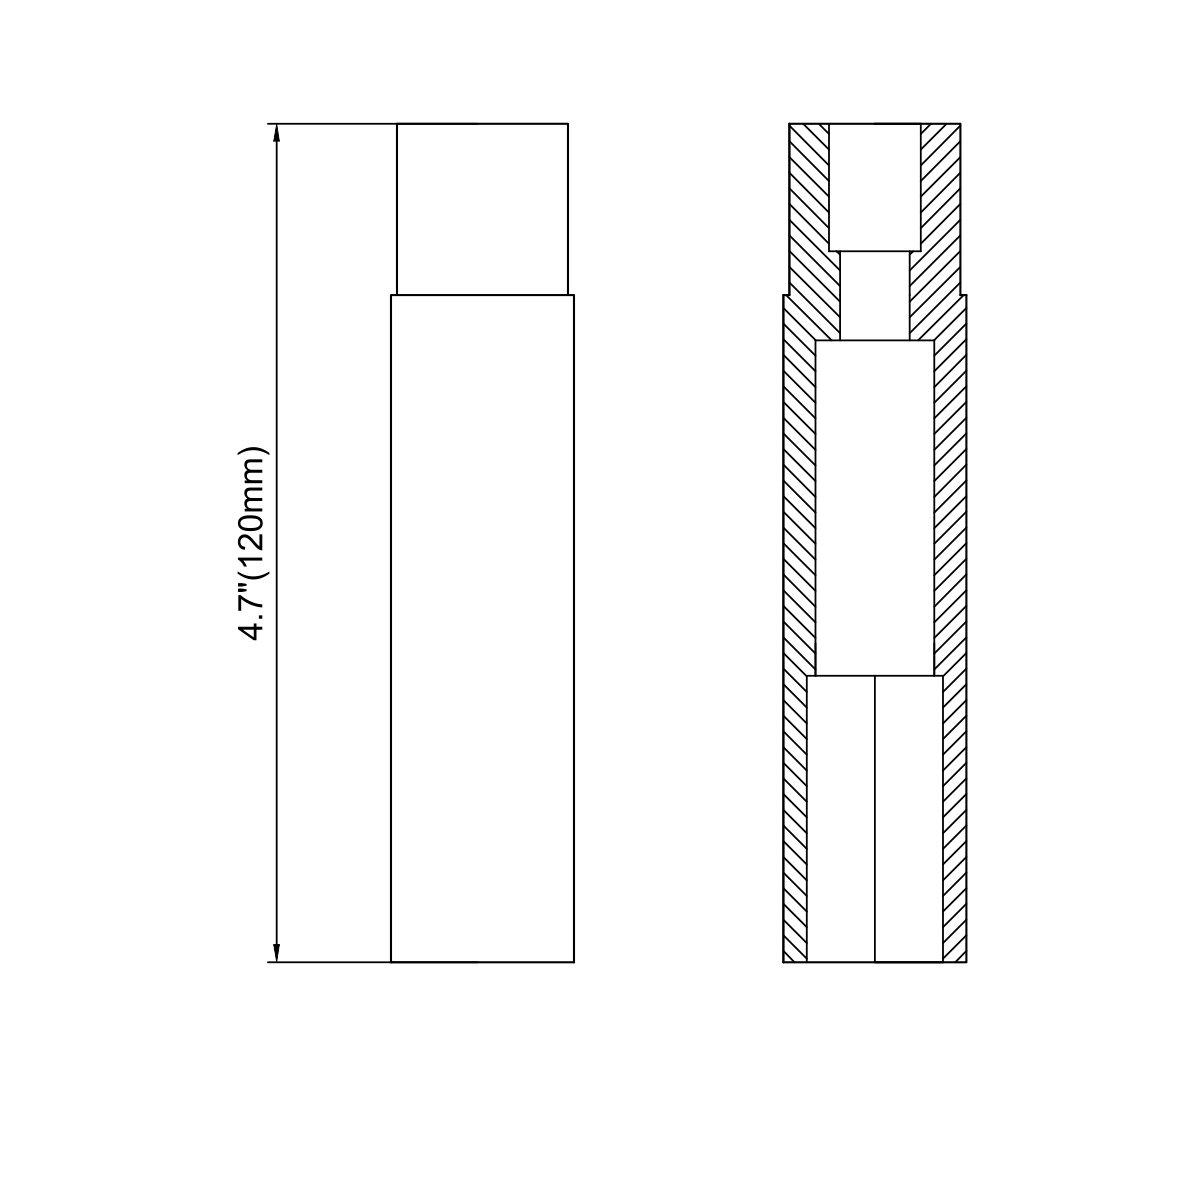 Cone//Conical Bulge Seat Silver Closed End Nuts with 1 Socket Key for Chevy Silverado Aftermarket Wheel FASTFREE Dynofit 14 mm x 1.5 Wheel Spike Lug Nuts 24 x Black M14x1.5 Lug Nut